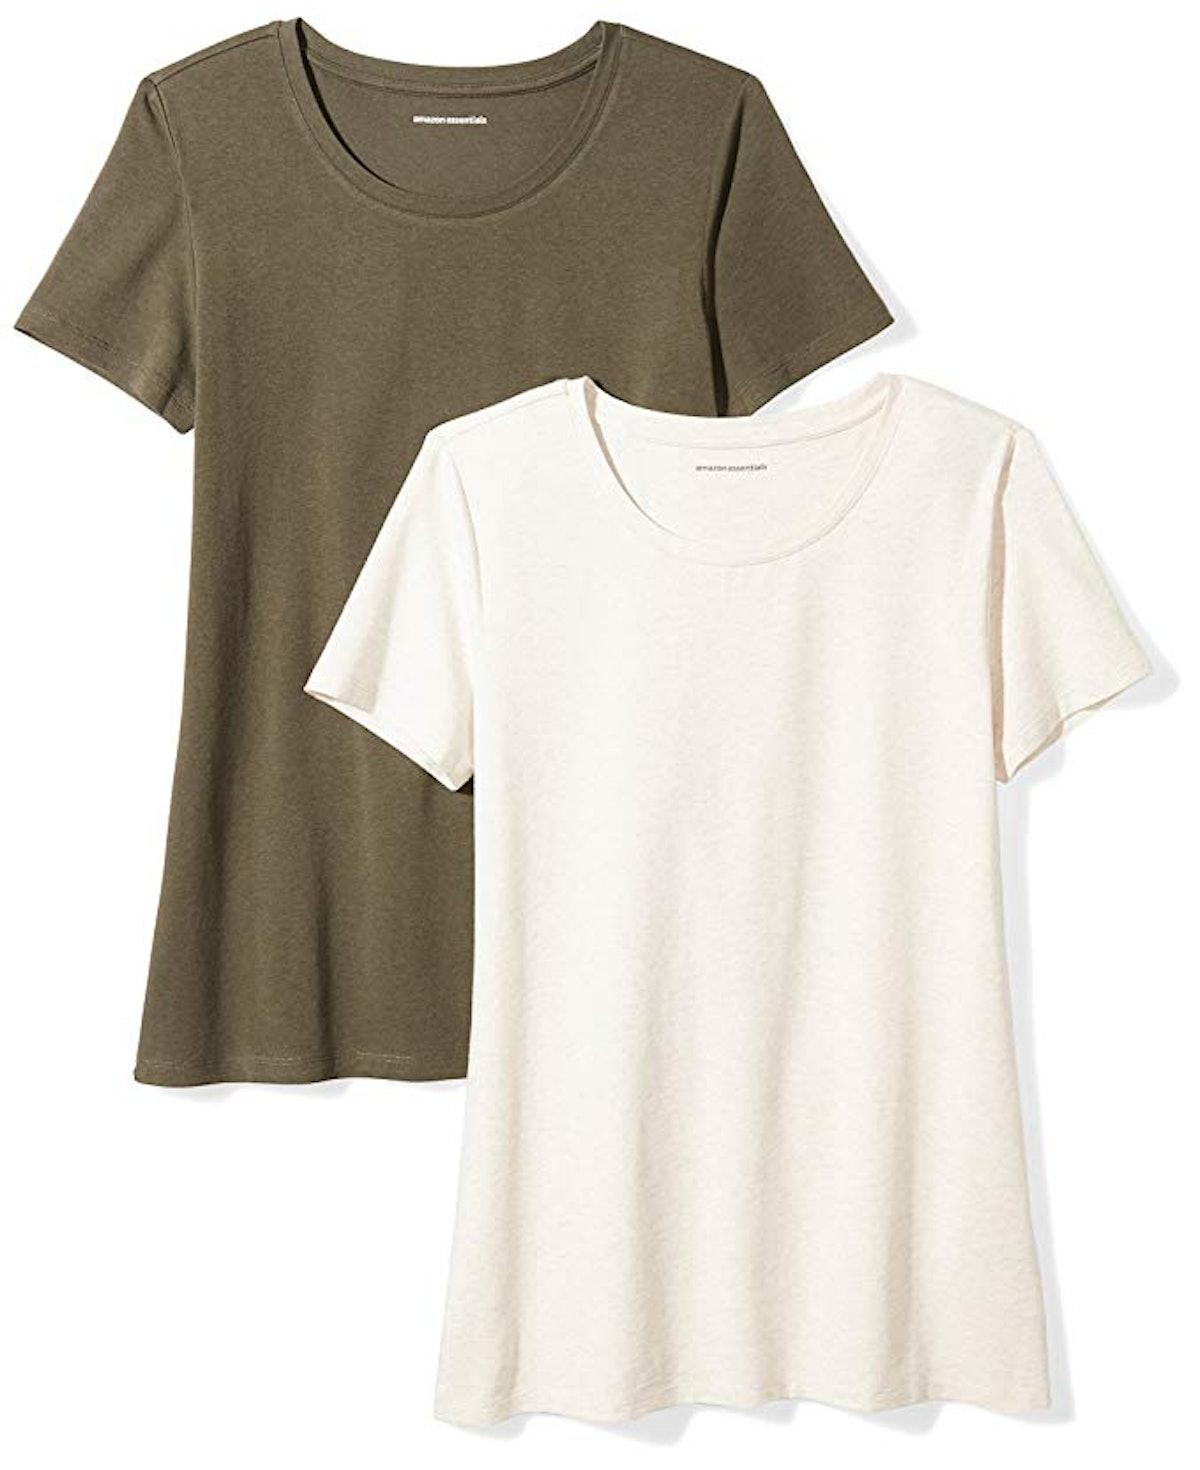 Amazon Essentials Women's Crewneck T-Shirts (2 Pack)